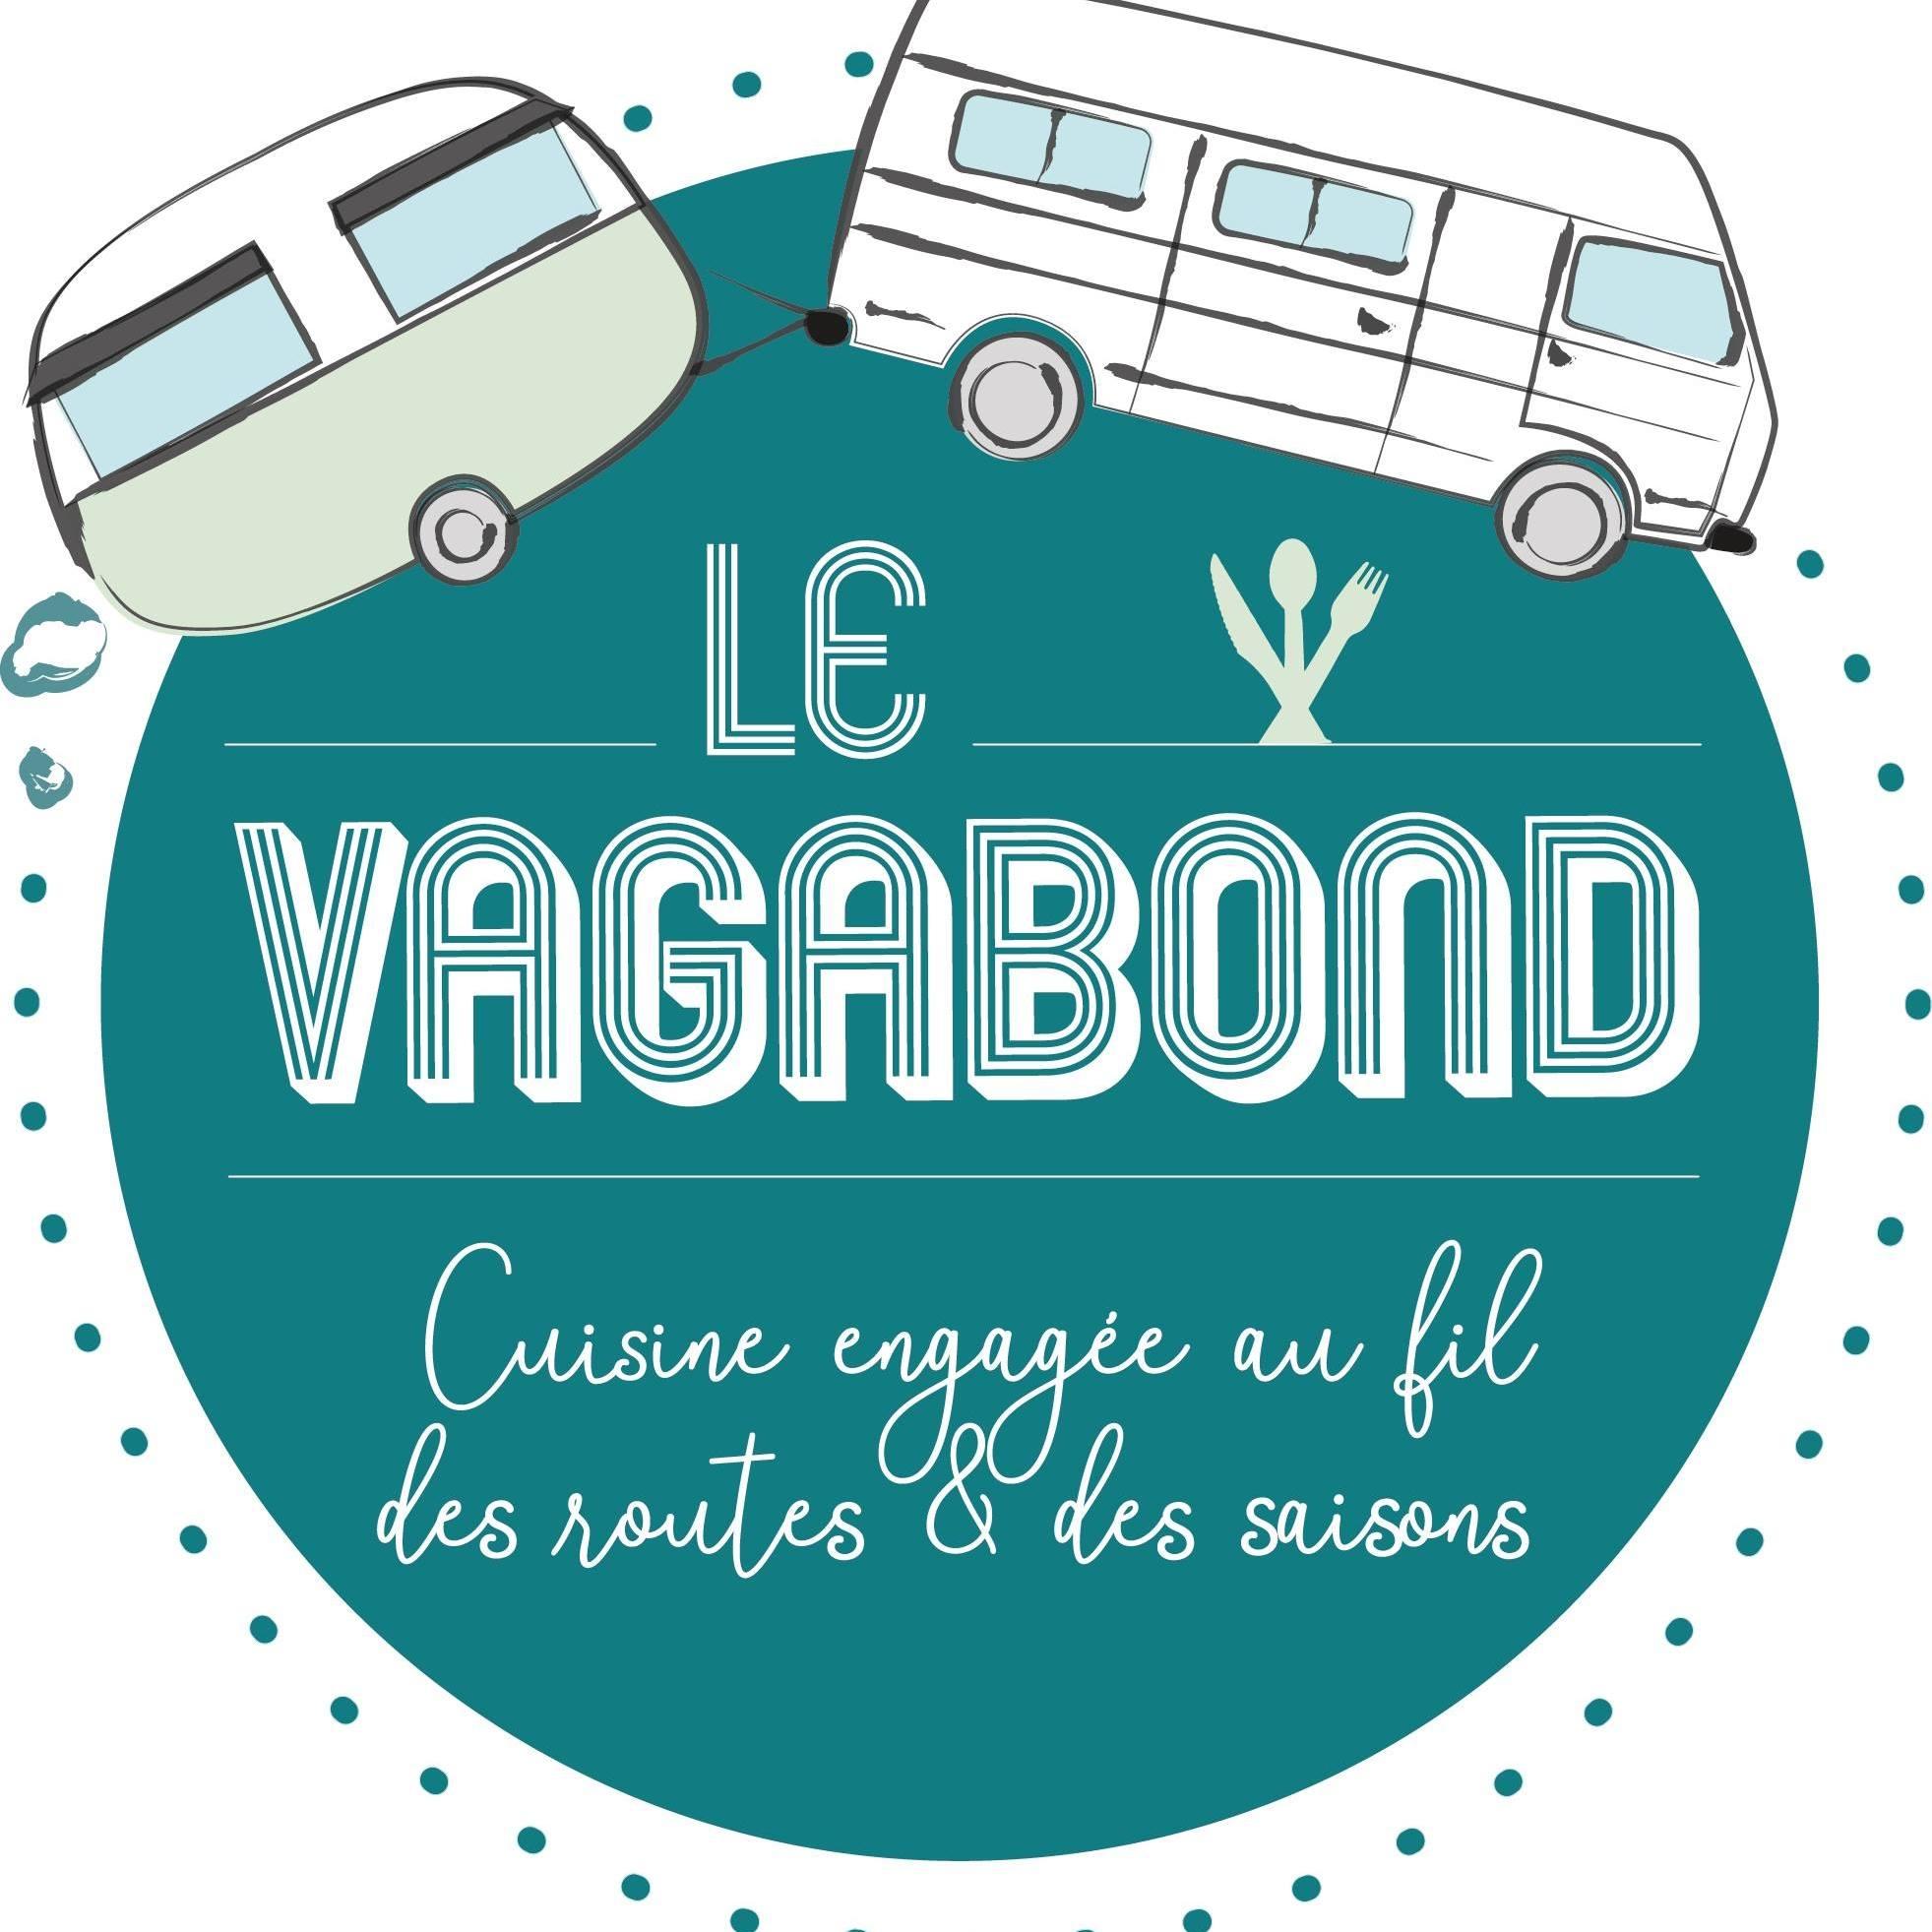 le vagabond food truck street bouche 2020 - Street Bouche